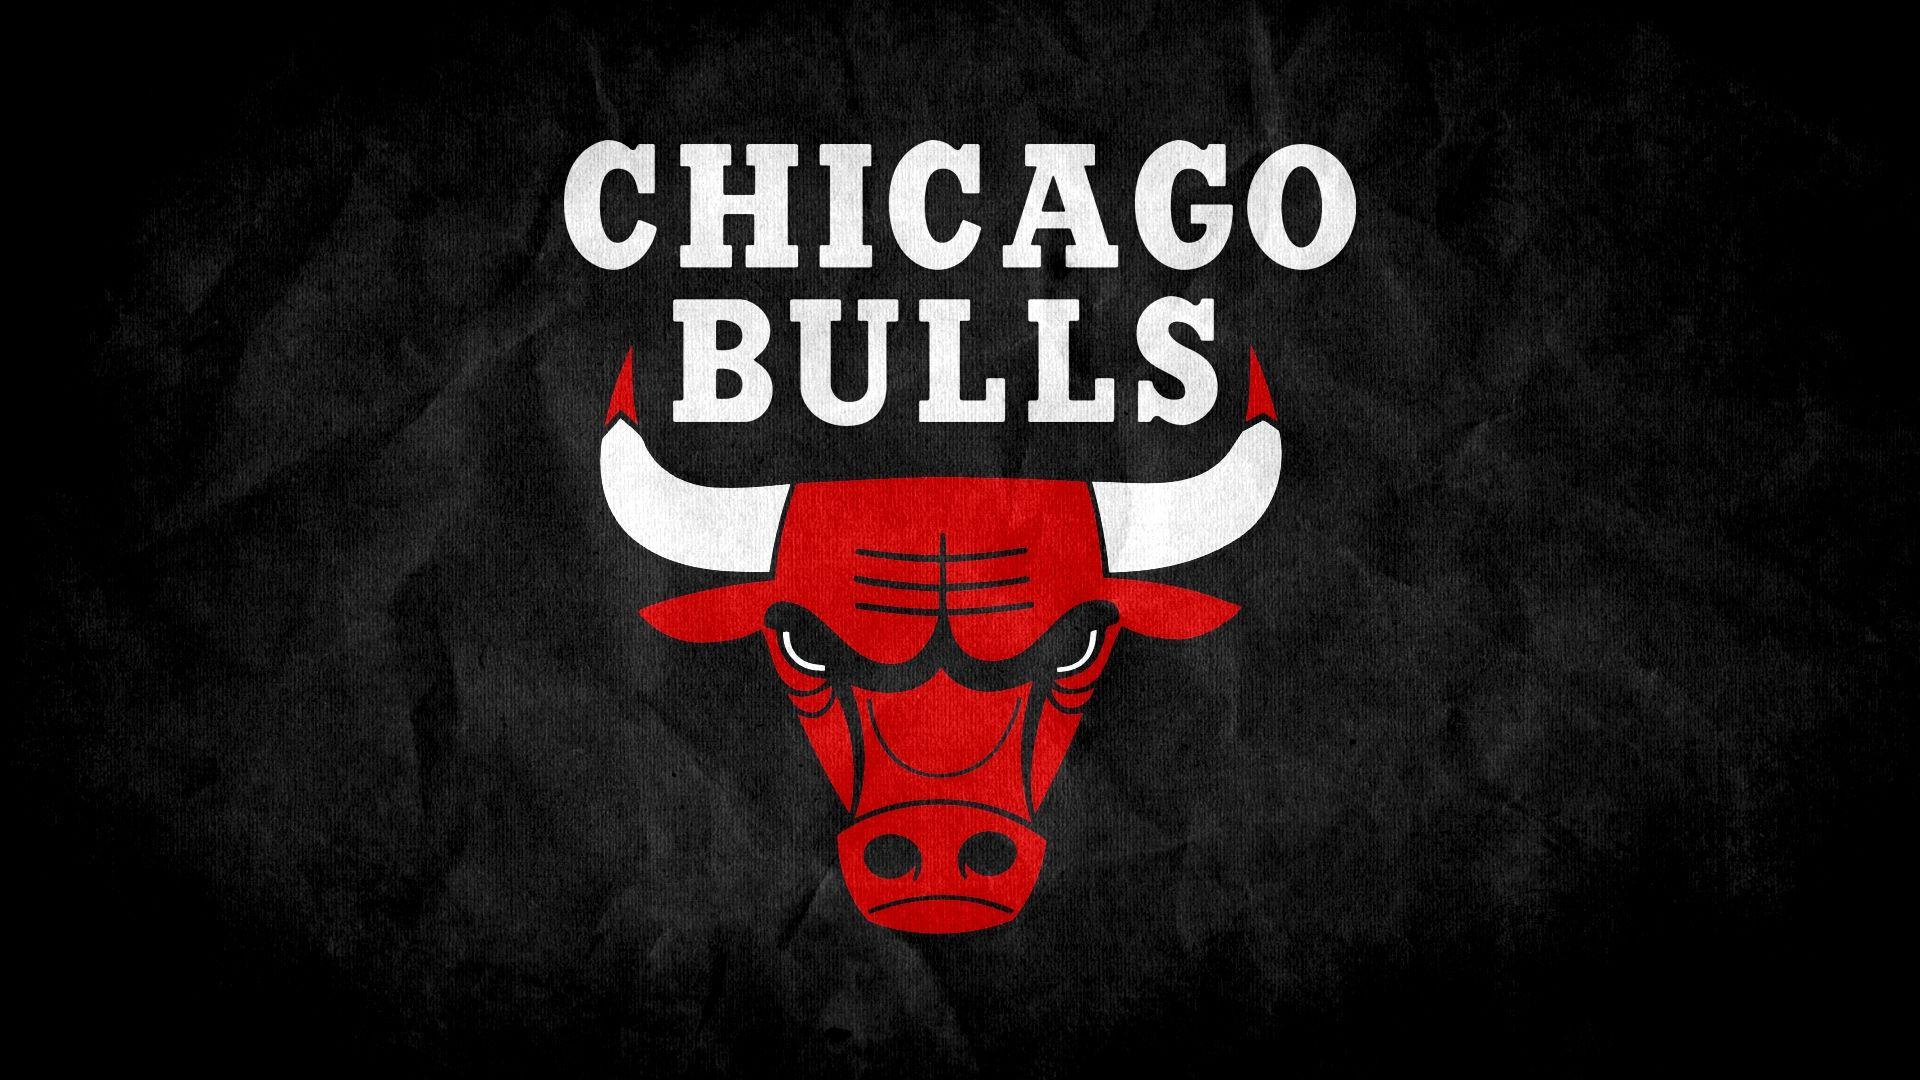 Chicago Bulls Logo Hd Wallpaper Chicago Bulls Logo Chicago Bulls Nba Chicago Bulls